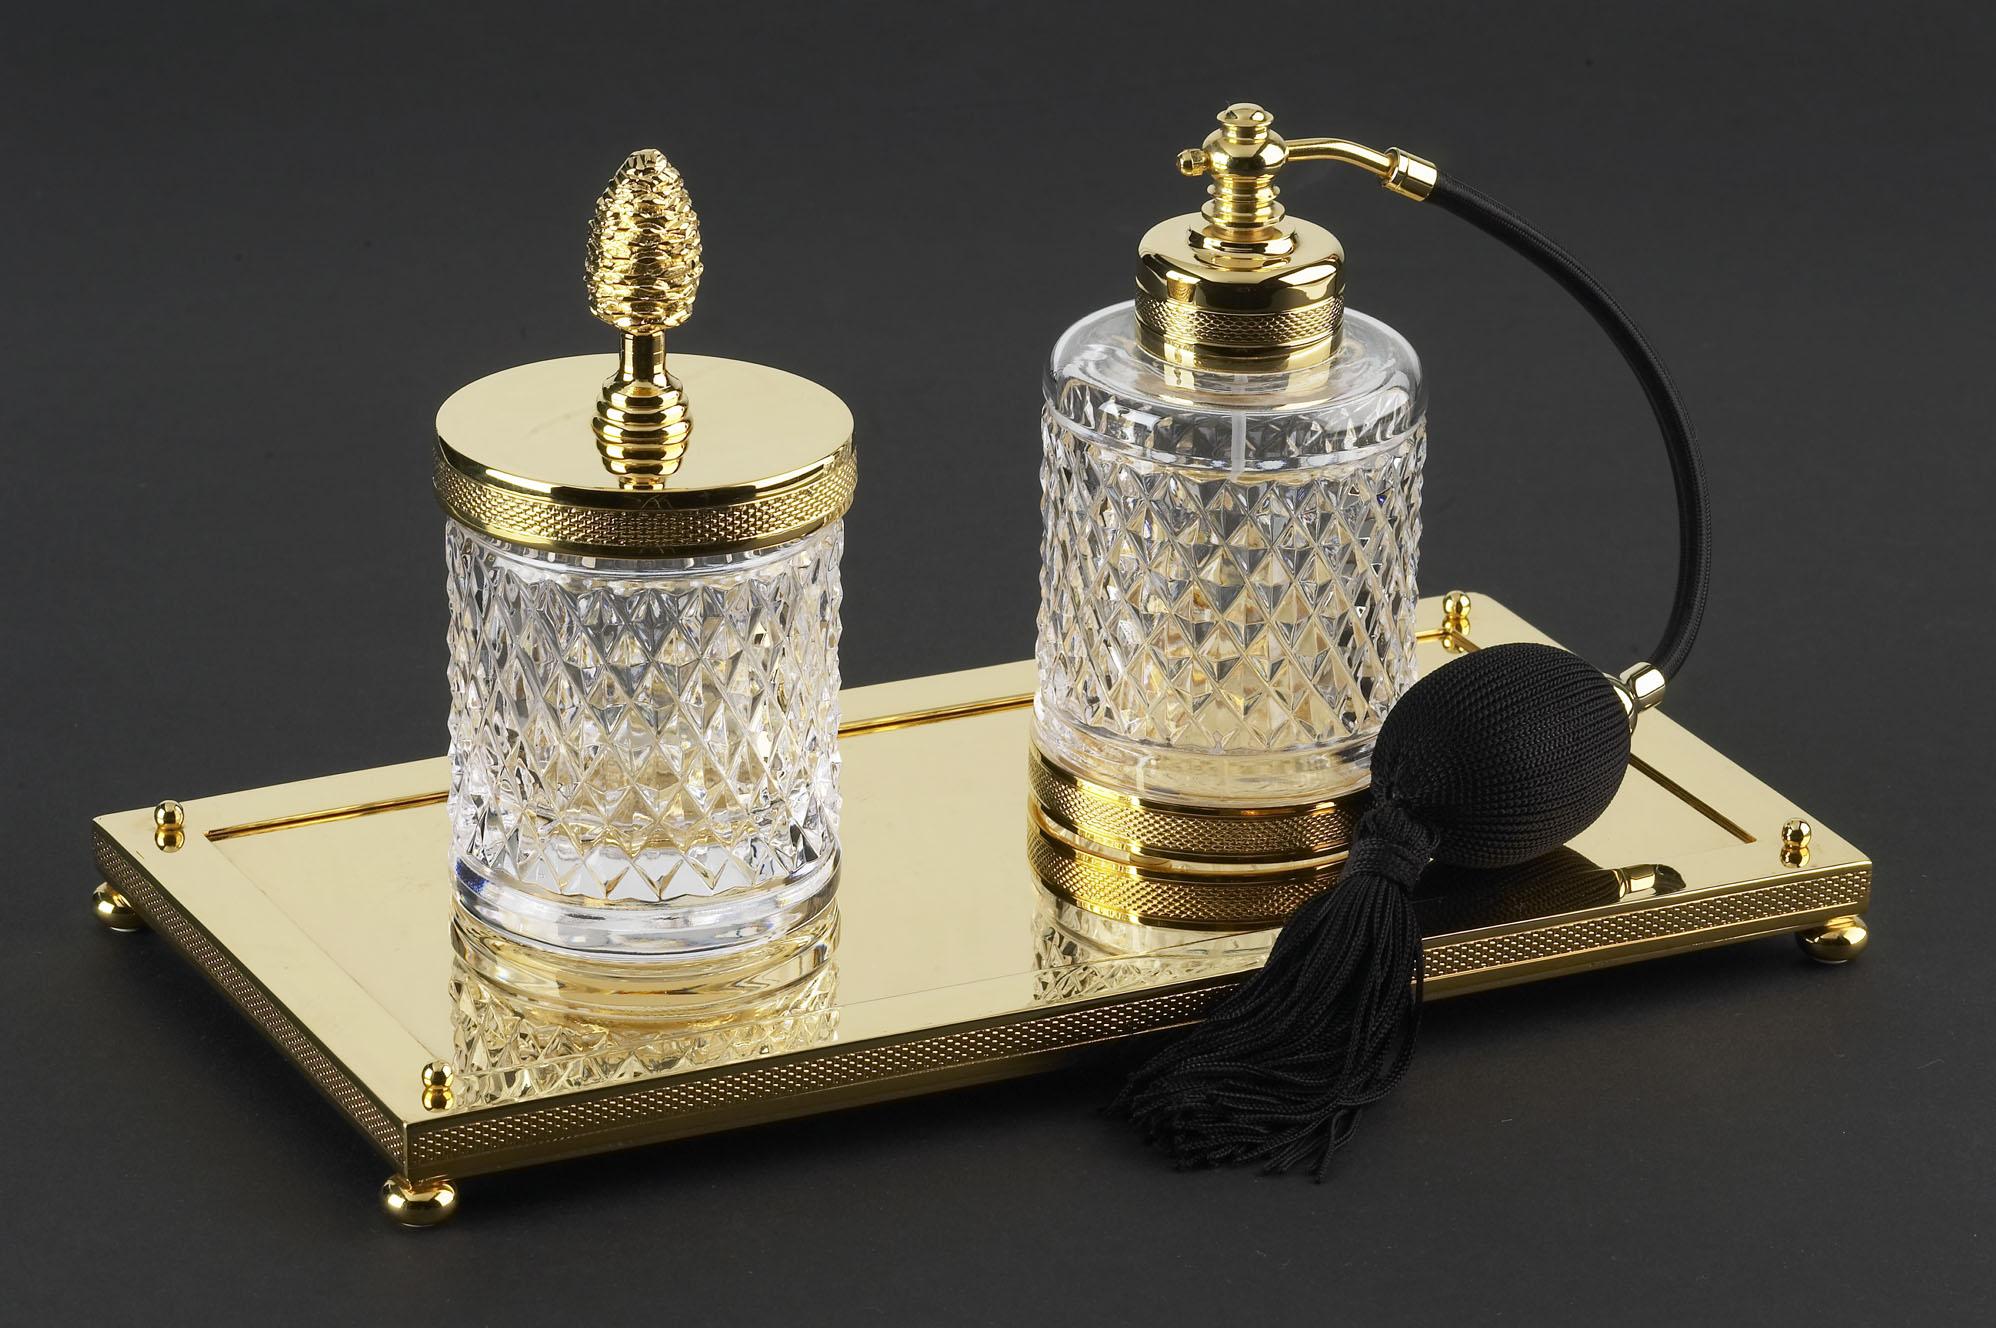 cristal et bronze 31516 tea pots cotton rectangular tray. Black Bedroom Furniture Sets. Home Design Ideas